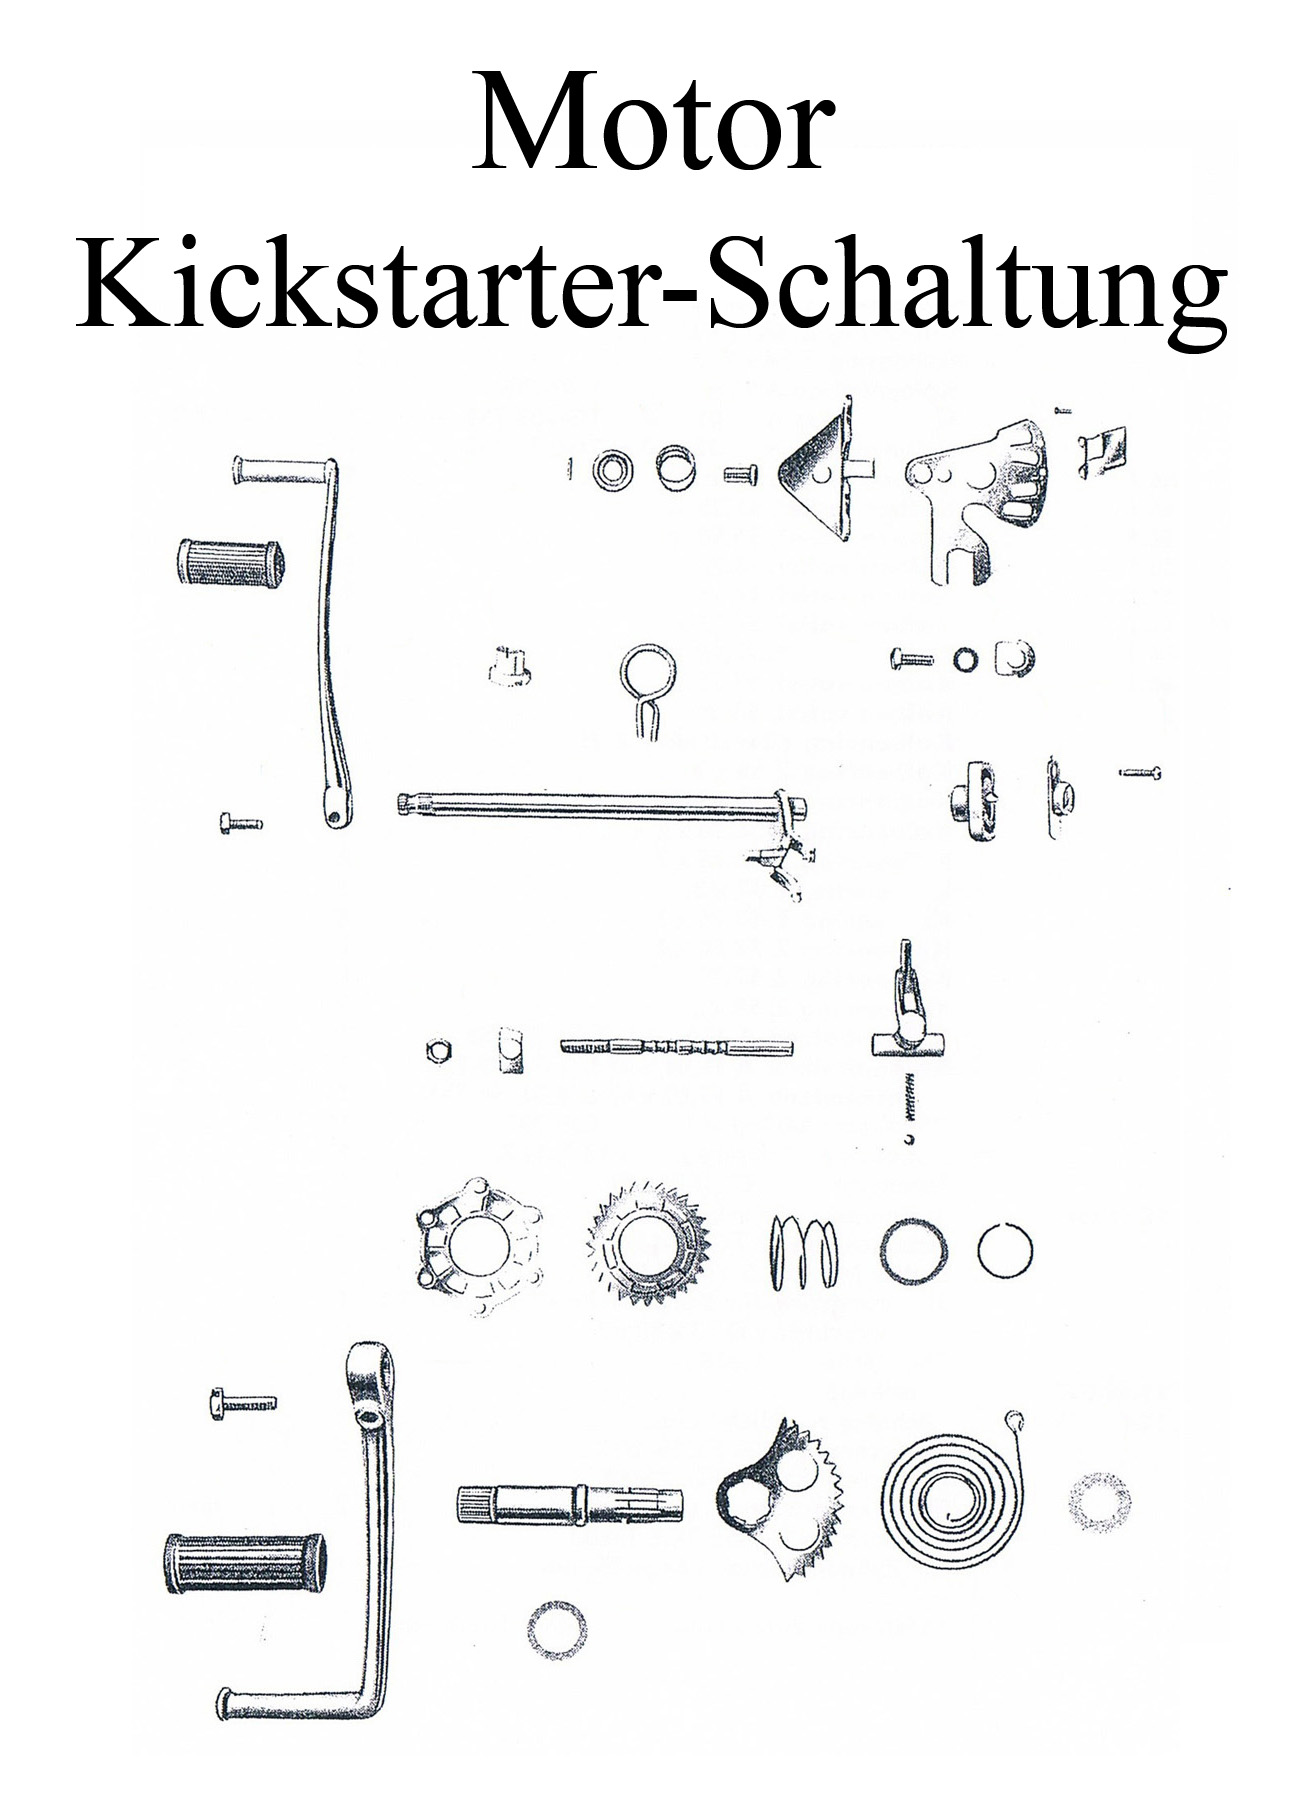 MZ ES 125-150/0-1 Ersatzteileliste Motor Schaltung Kickstartersegment Schalthebelgummi Welle